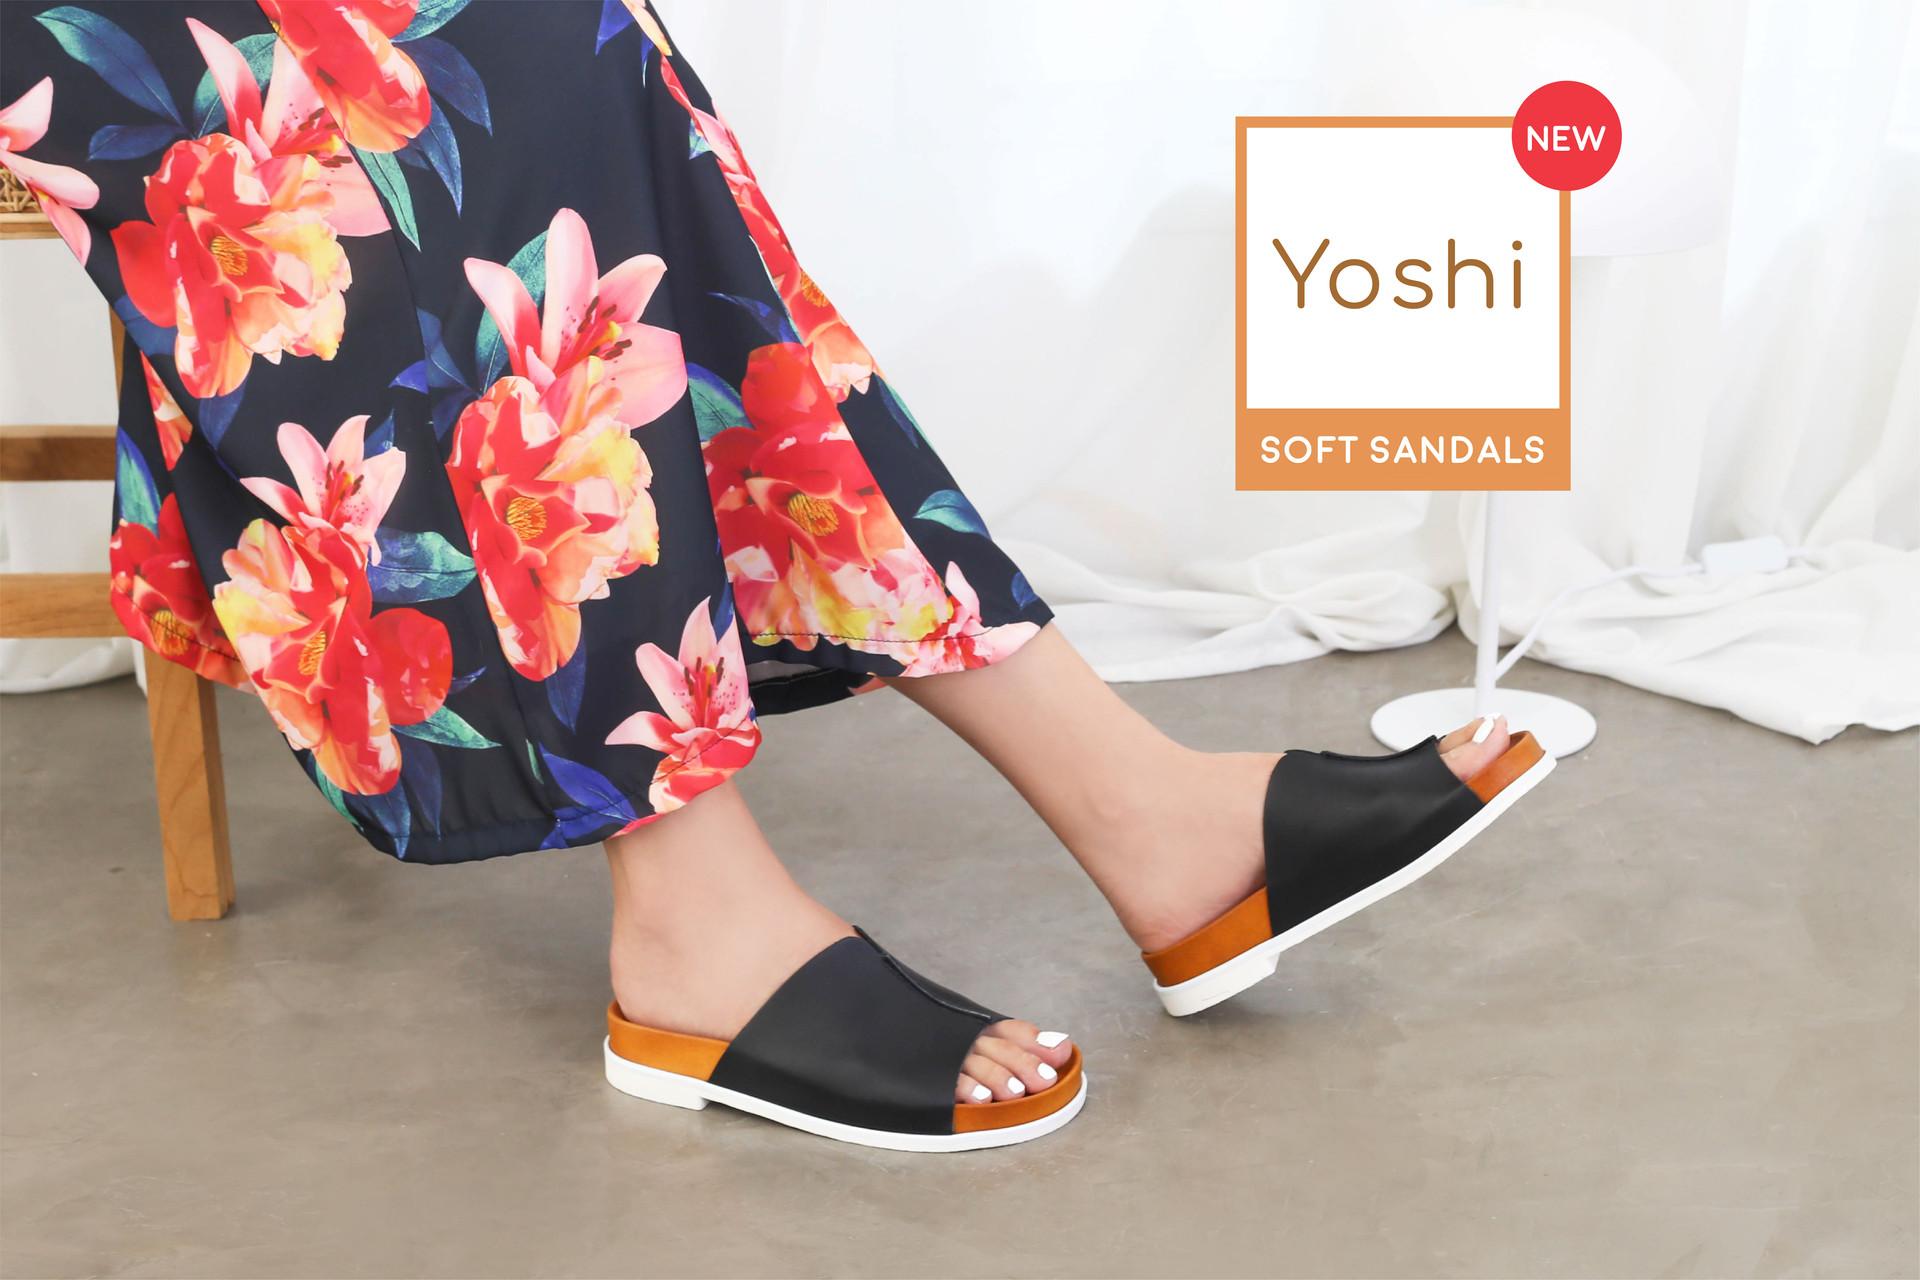 Yoshi, Soft Sandals